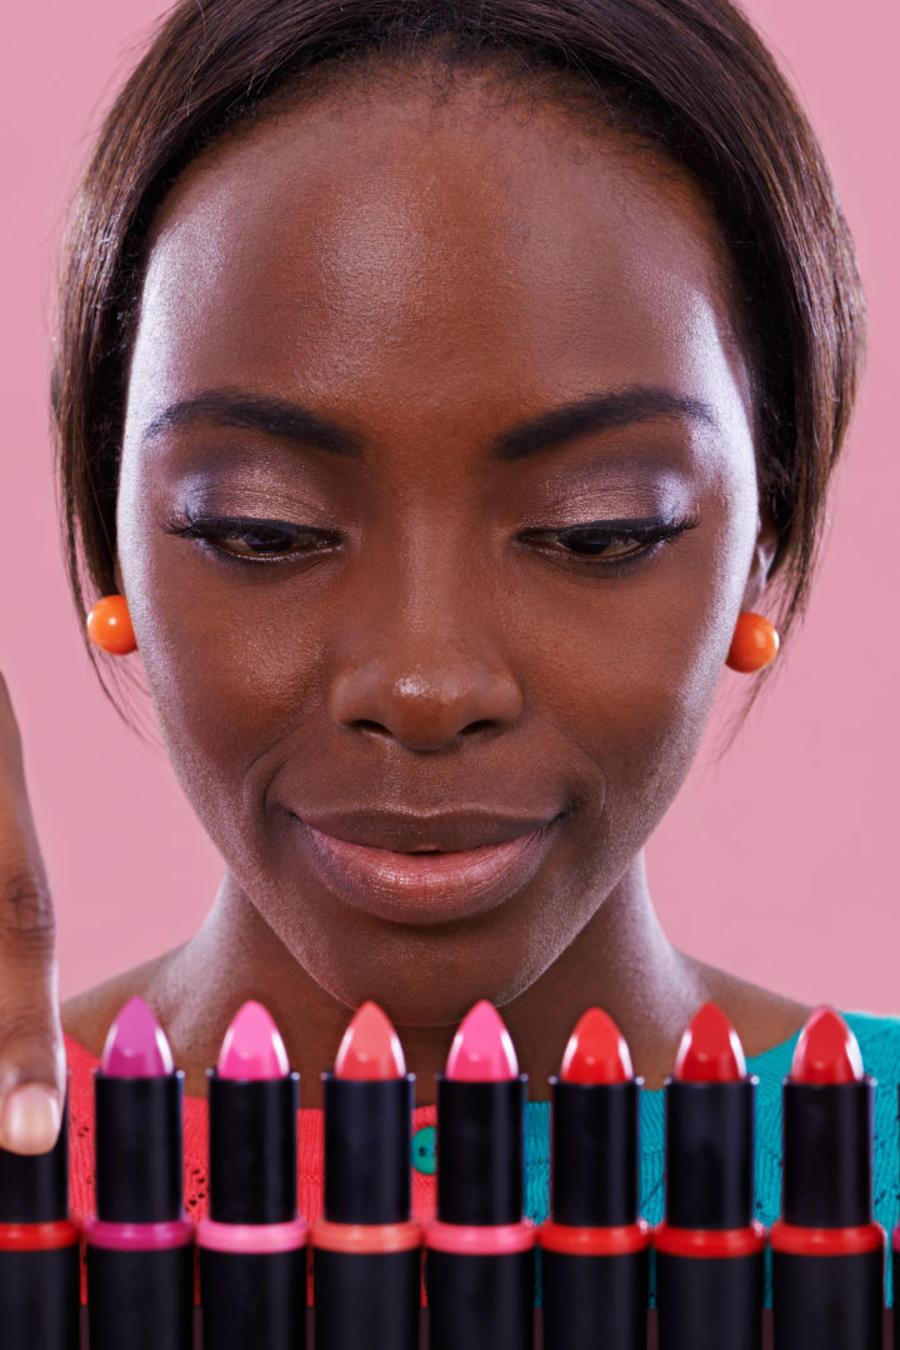 Mujer usando maquillaje